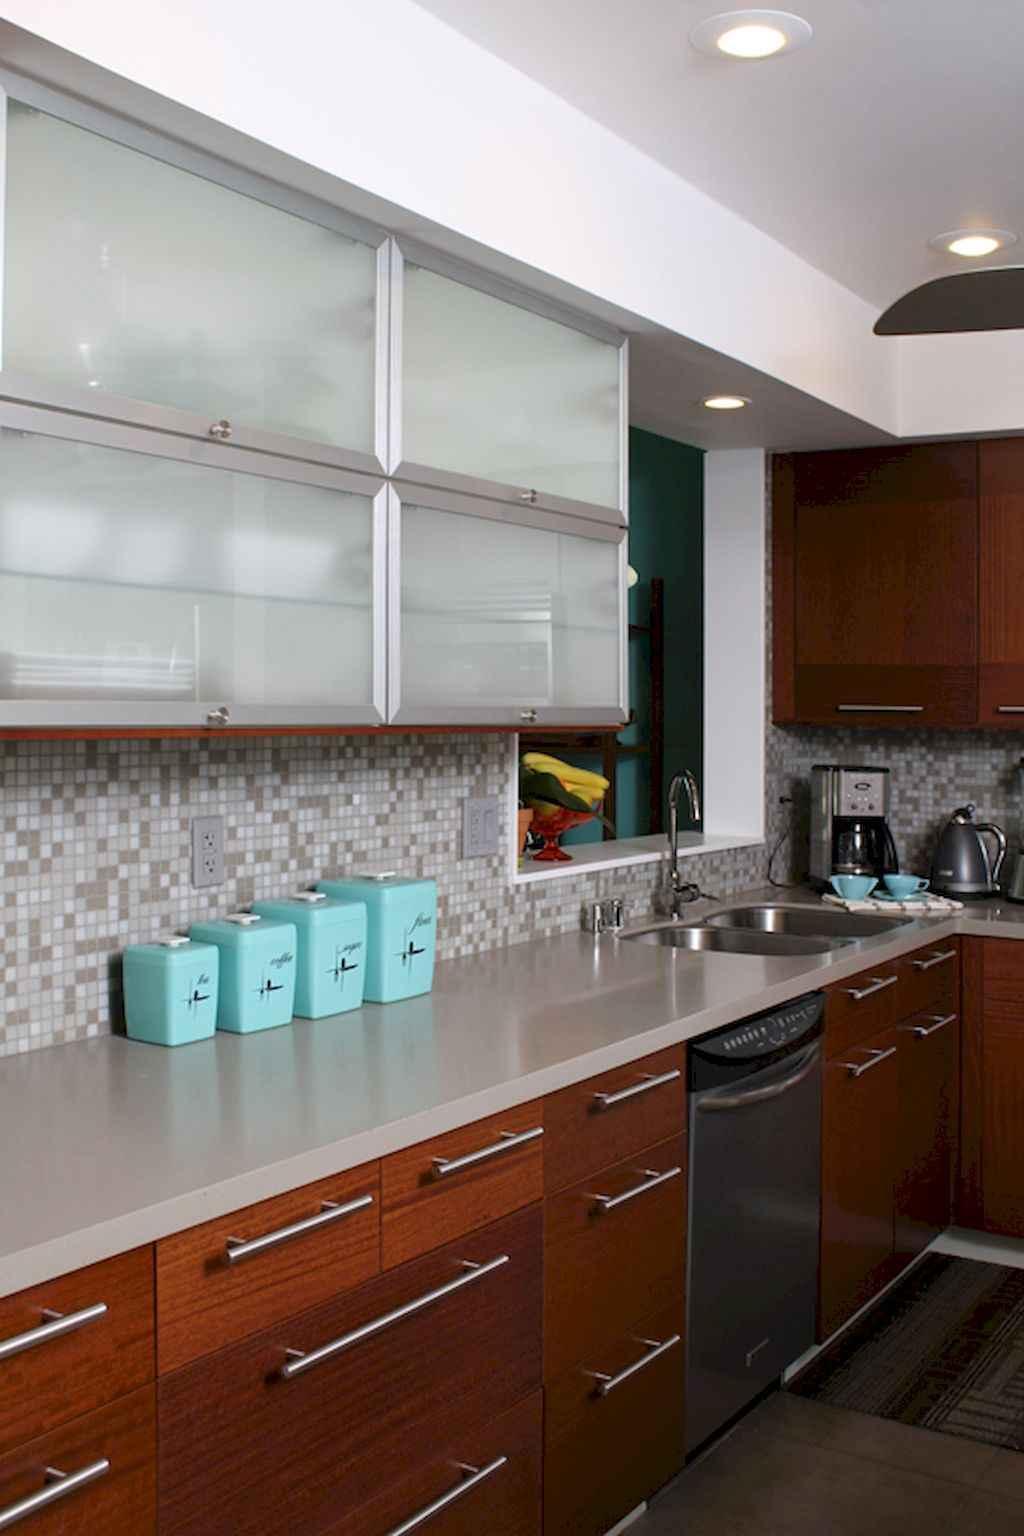 Mid century modern kitchen design ideas (16)